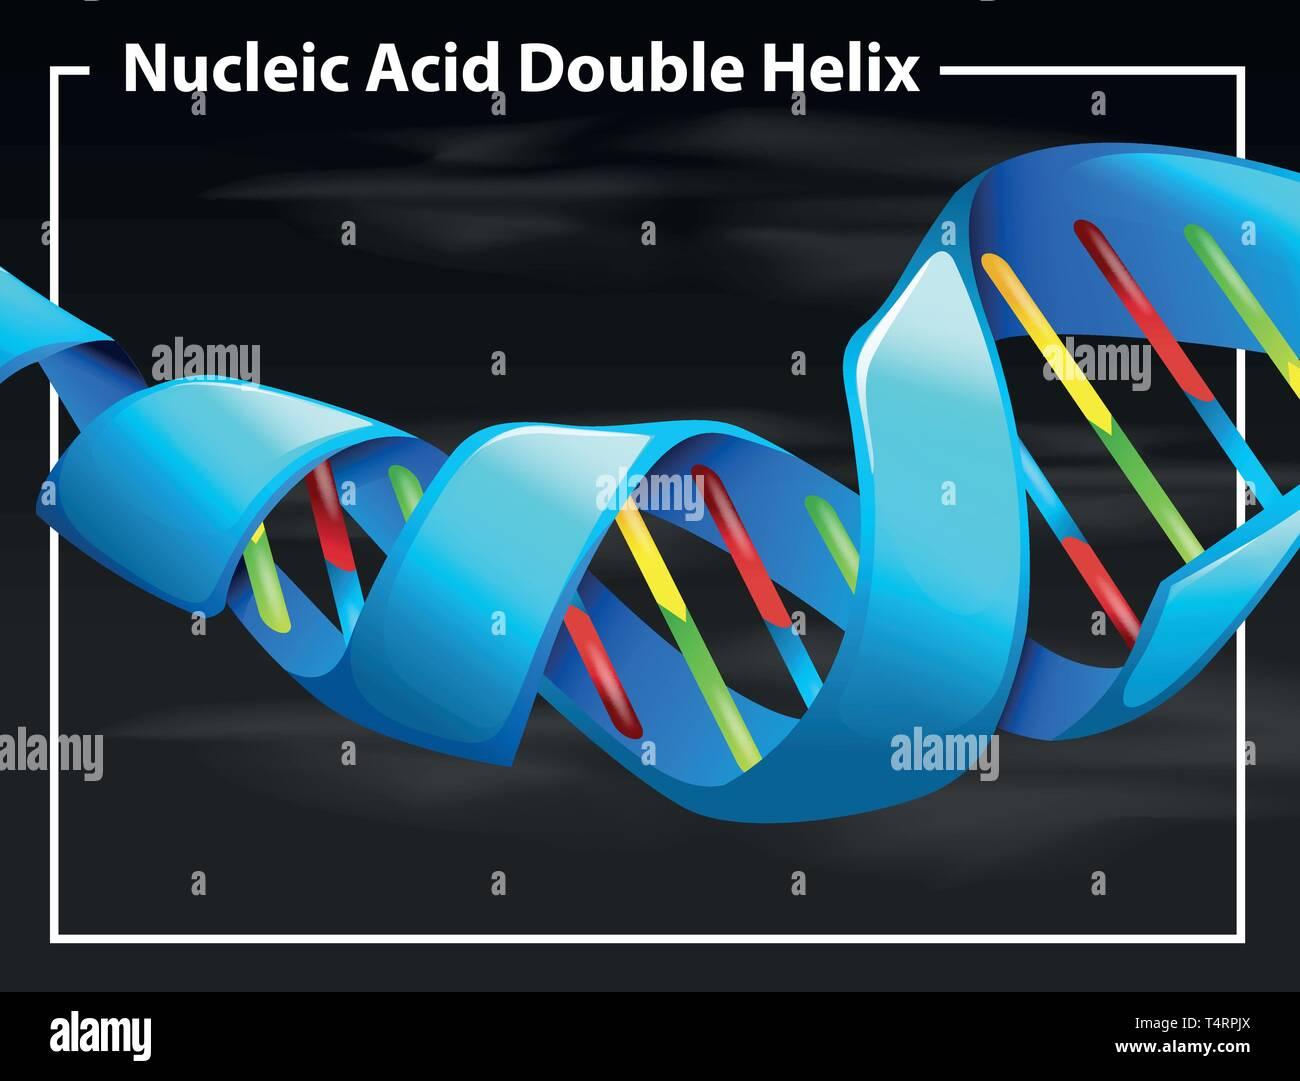 Nucleic acid double helix illustration - Stock Image